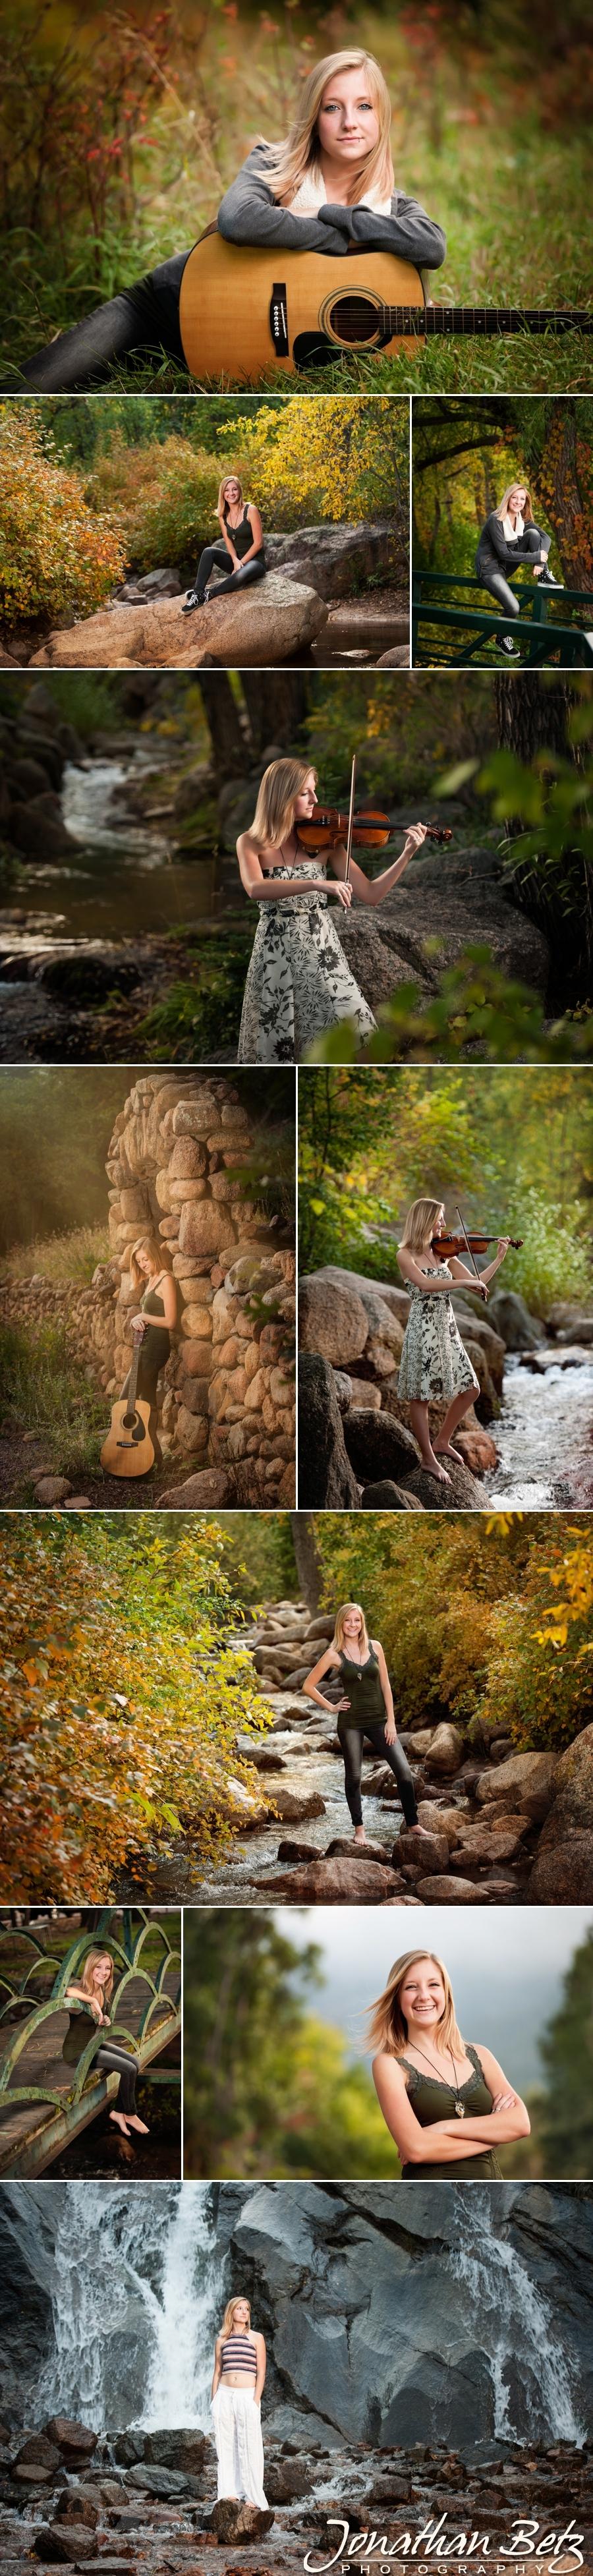 Doherty High School Senior Photographer Jonathan Betz Photography Colorado Springs Portraits 1